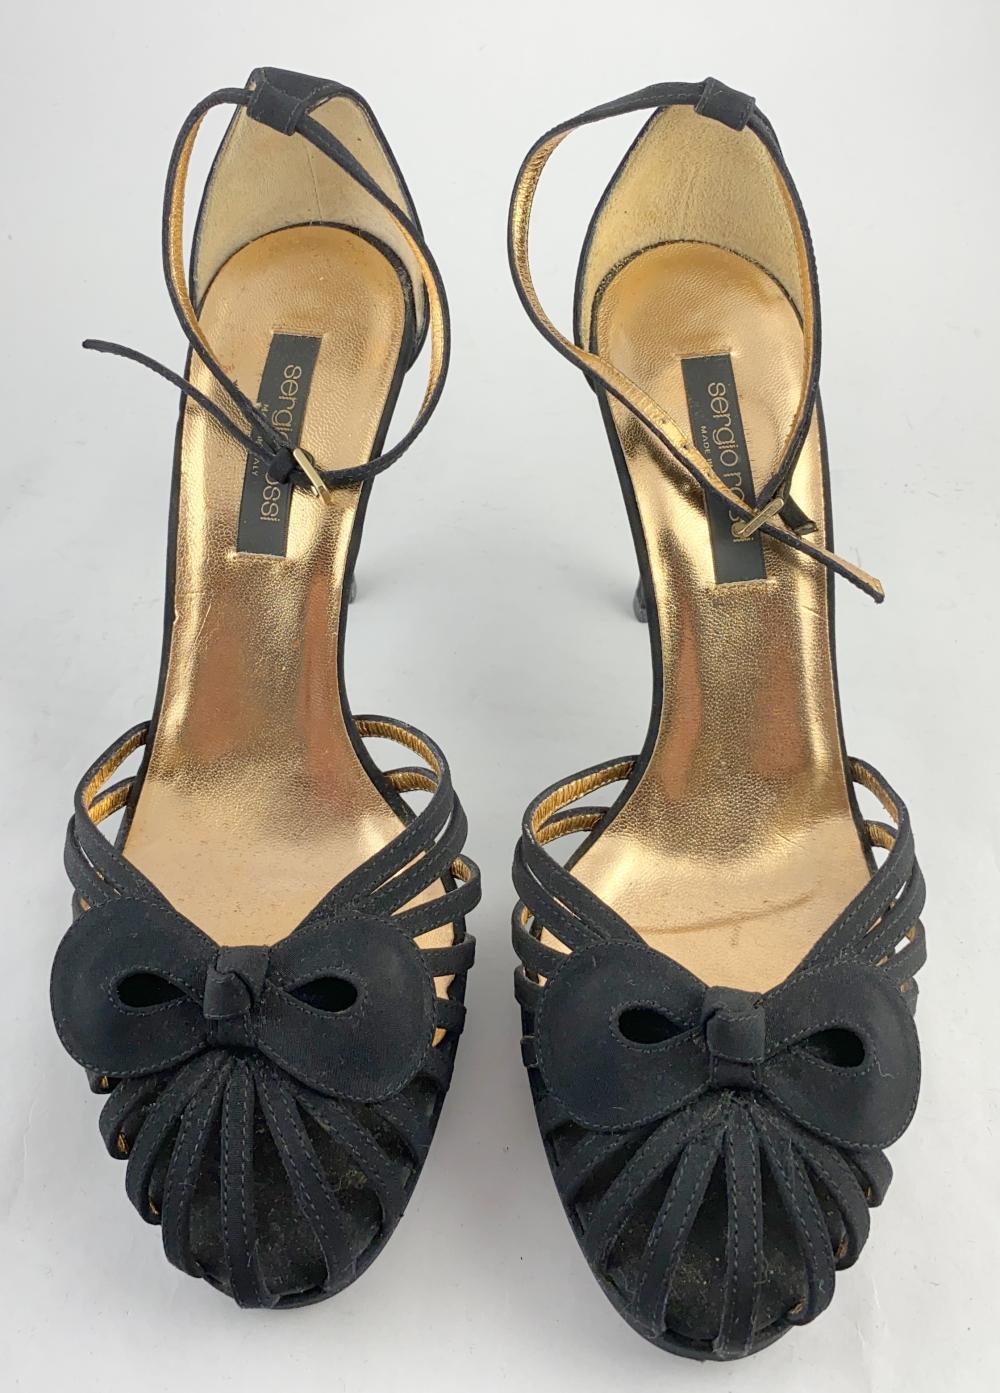 Sergio Rossi, Italy: Black Suede & Leather Stilettos, Bow to Toe